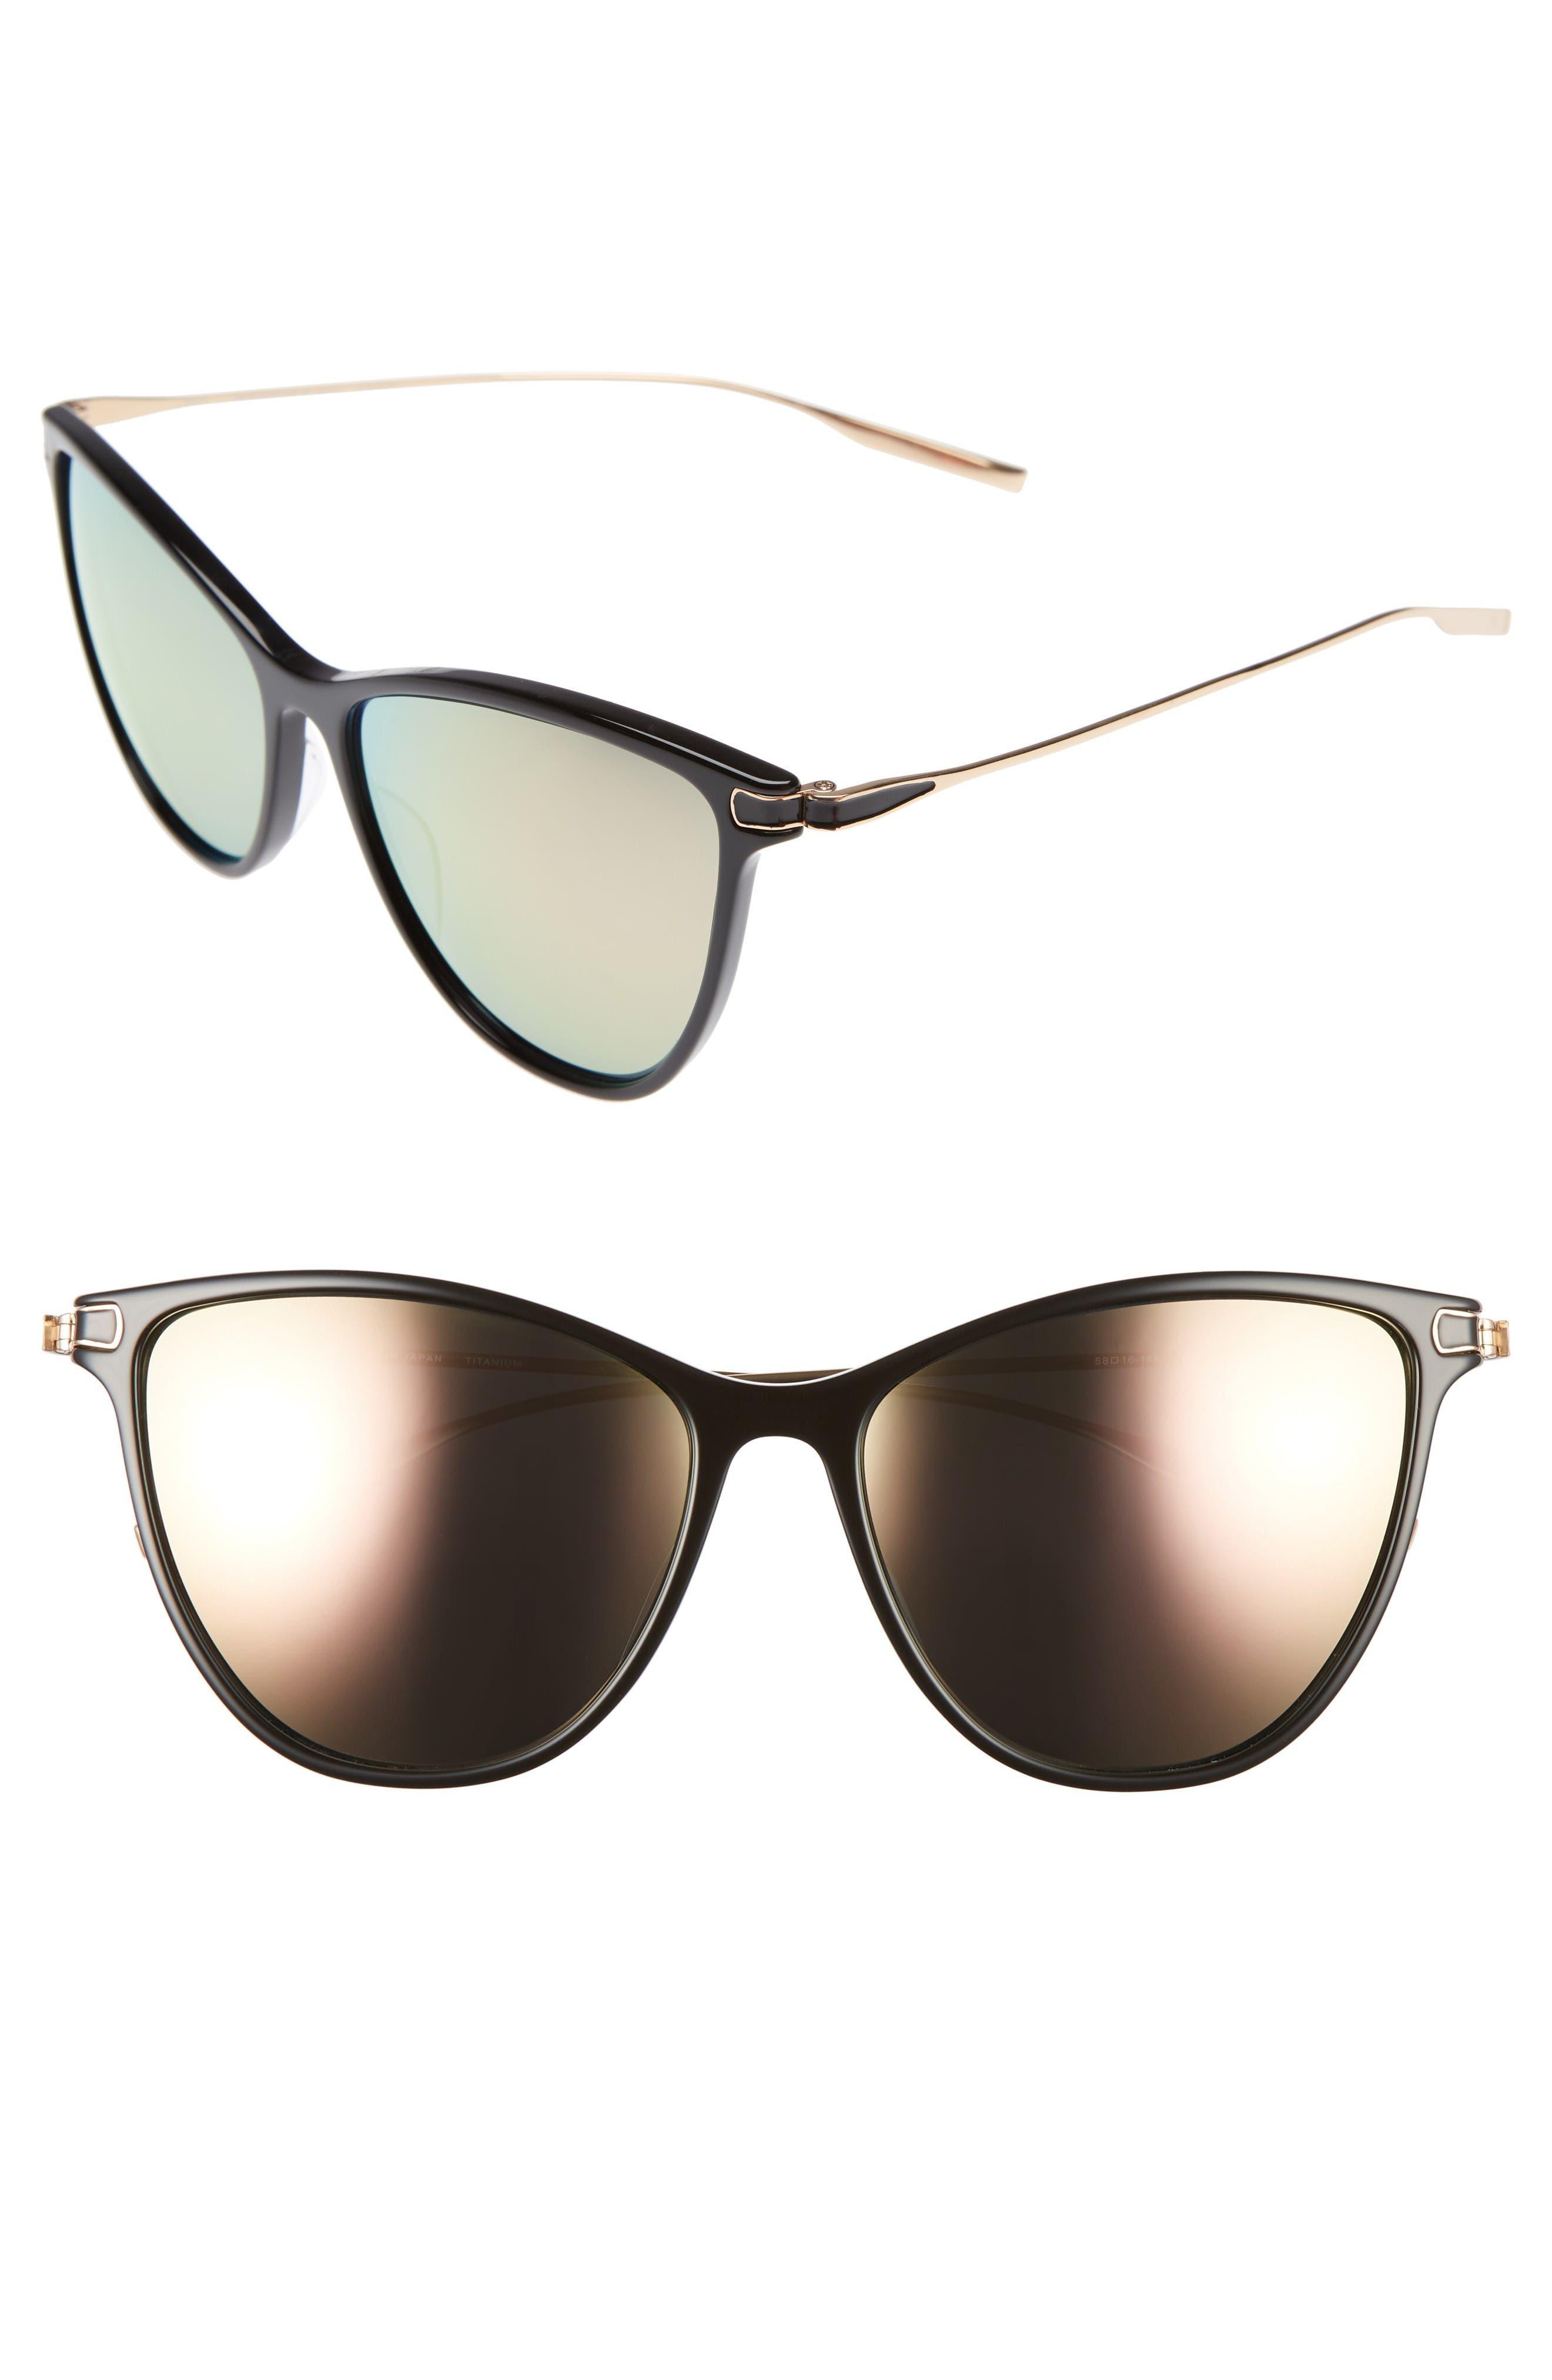 SALT Nia 58mm Polarized Cat Eye Sunglasses